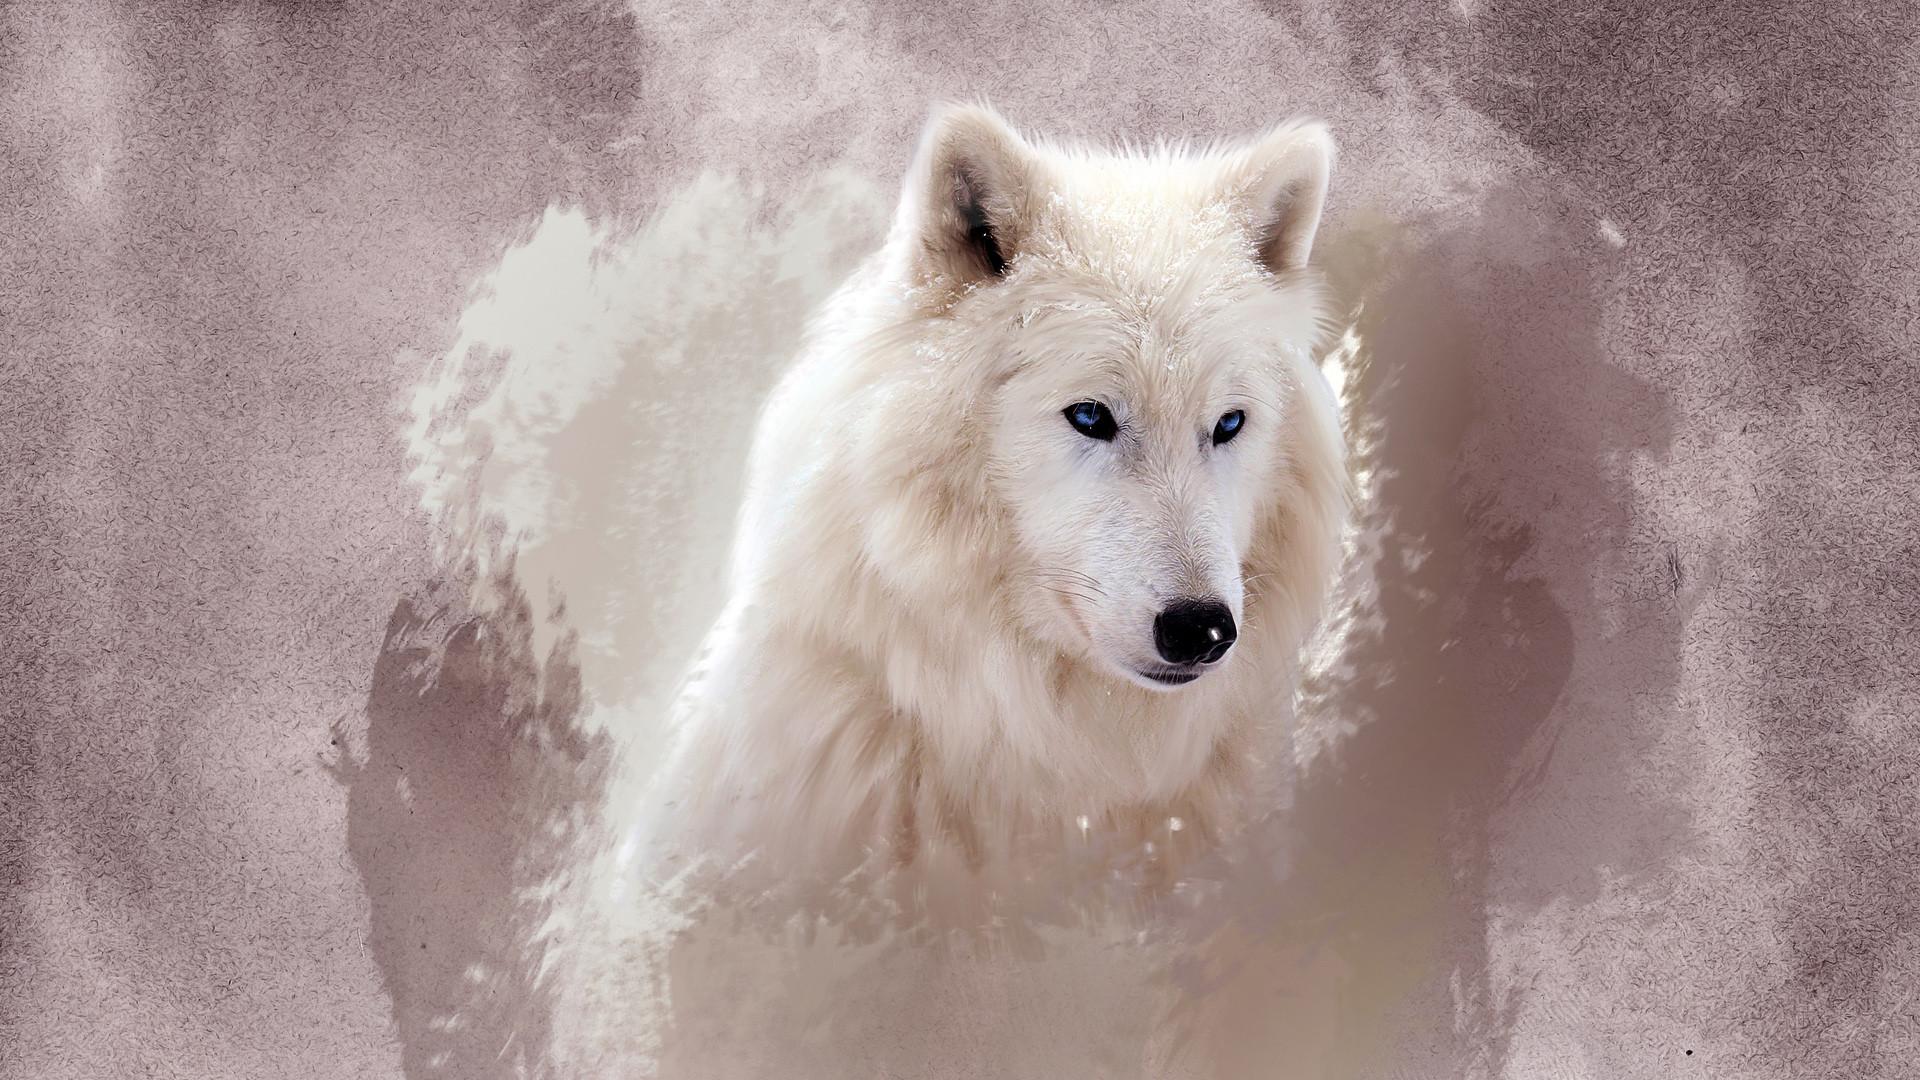 Res: 1920x1080, Author: MachiavelliCro. Tags: Wolf